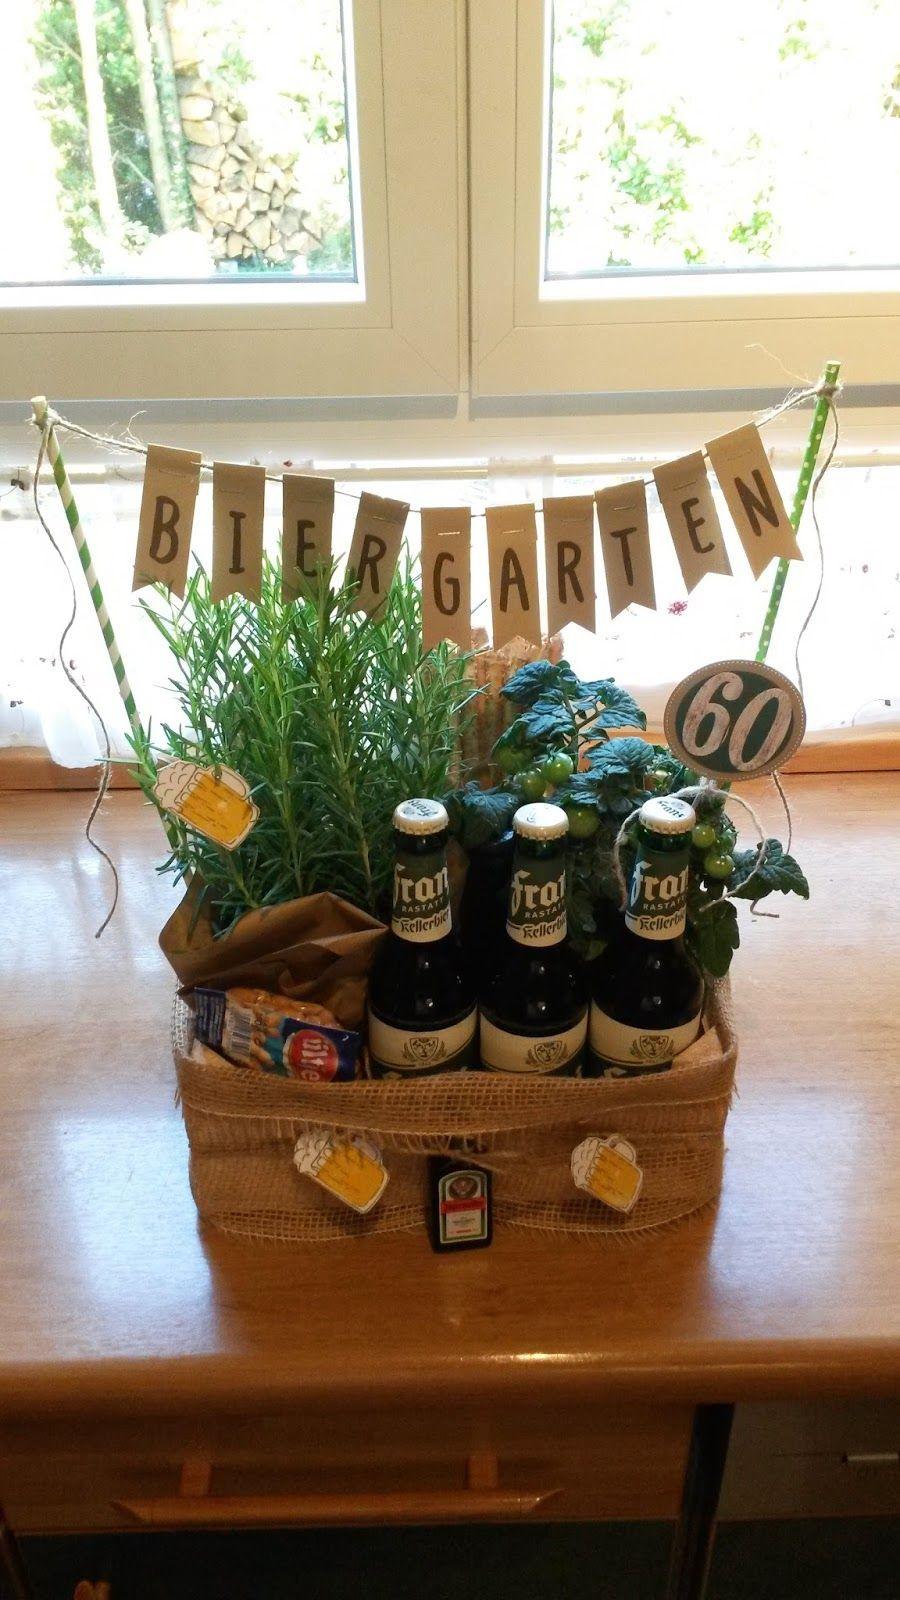 Geburtstagsgeschenke Zum 60  Biergarten 60 Geburtstag Geschenk